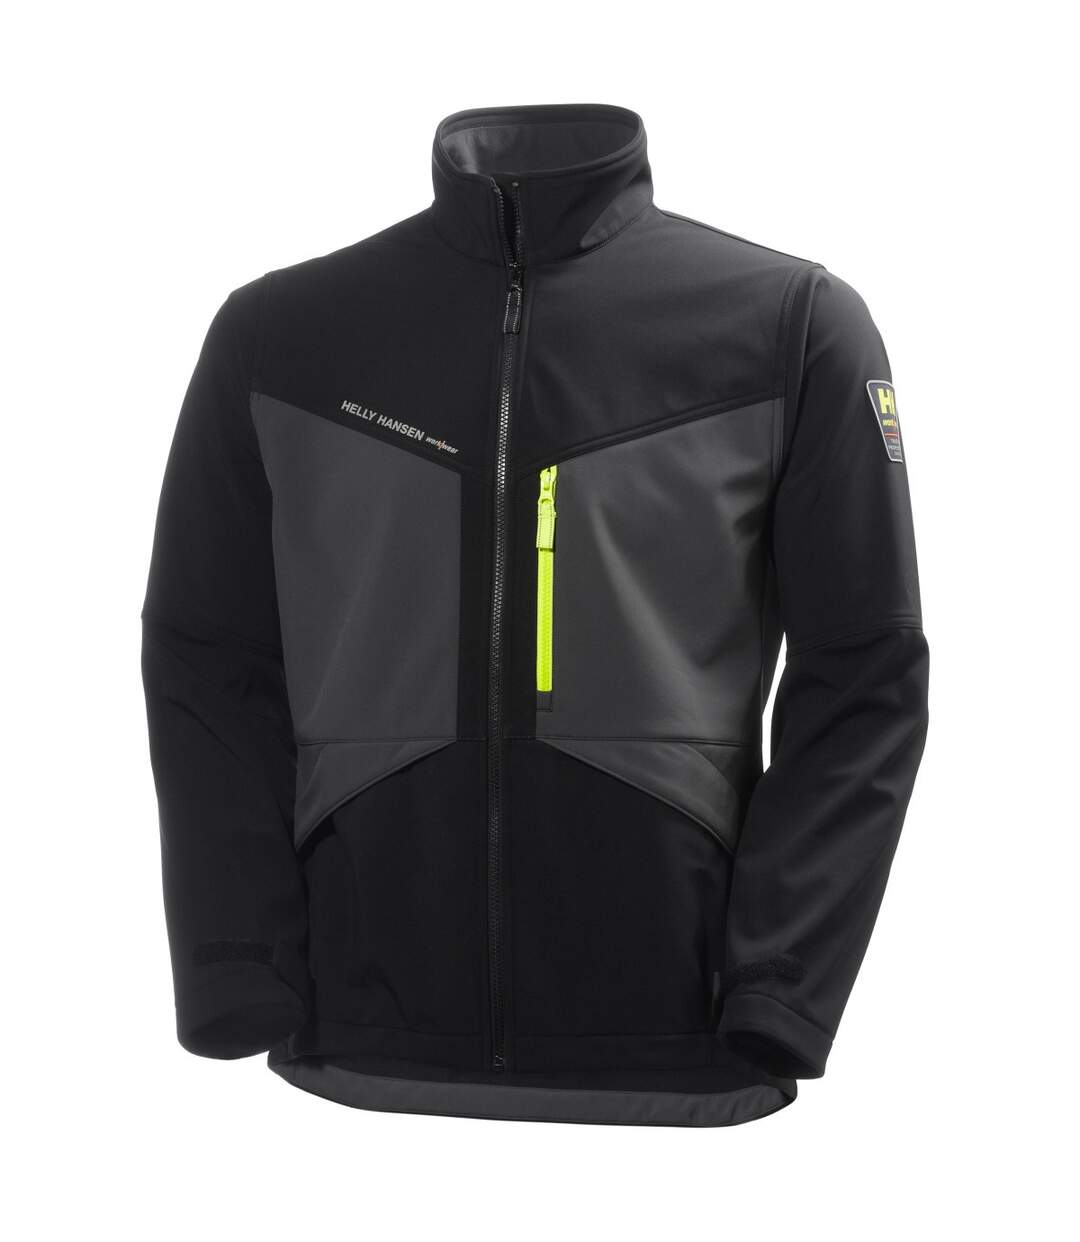 Helly Hansen Mens Aker Softshell Jacket (Jet Black/Dark Grey) - UTBC3947